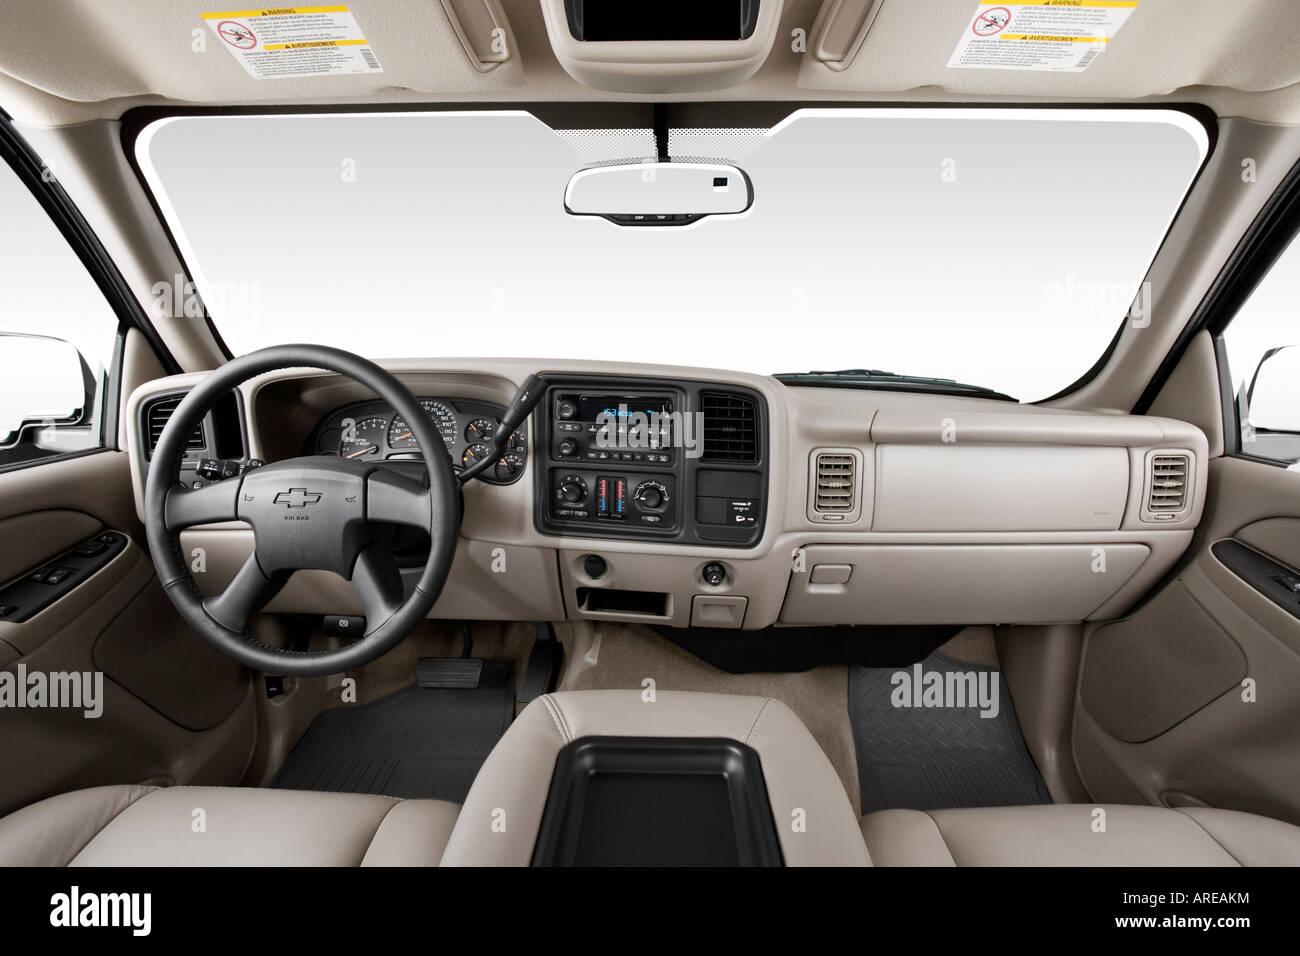 All Chevy chevy 2500hd 2006 : 2006 Chevrolet Silverado 2500 LT in Black - Dashboard, center ...